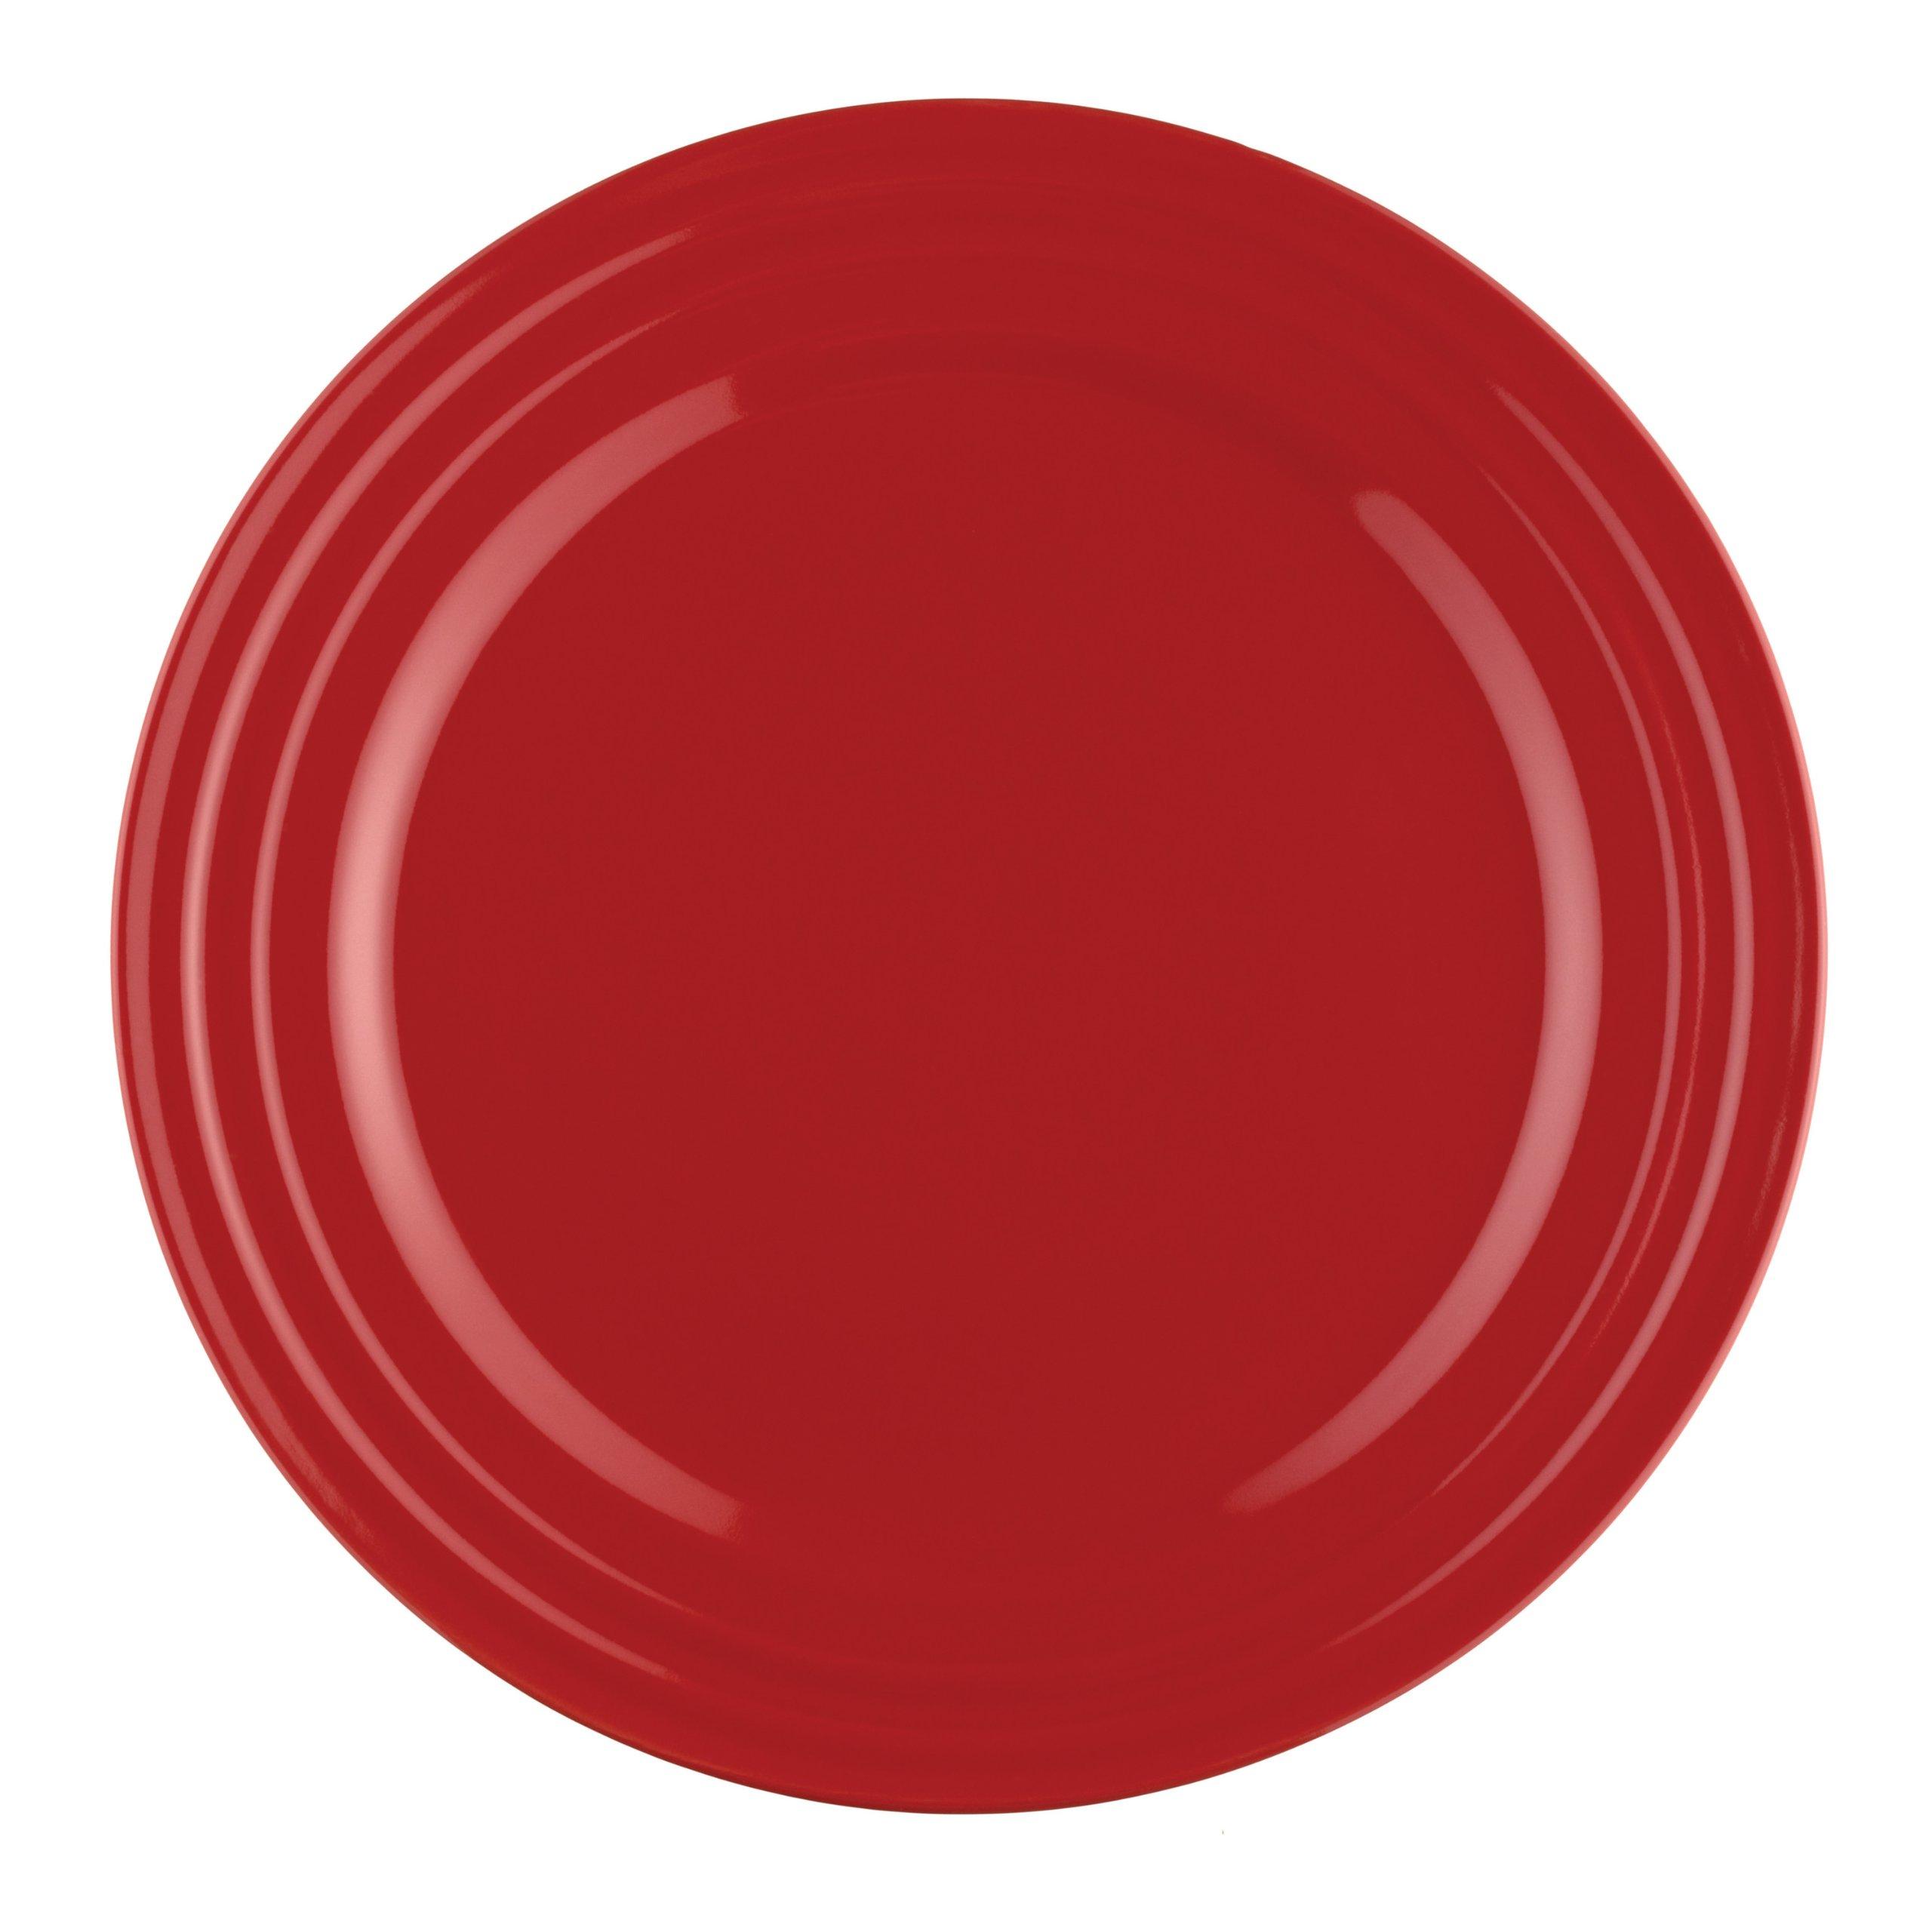 Rachael Ray Dinnerware Double Ridge Dinner Plate Set, 4-Piece, Red